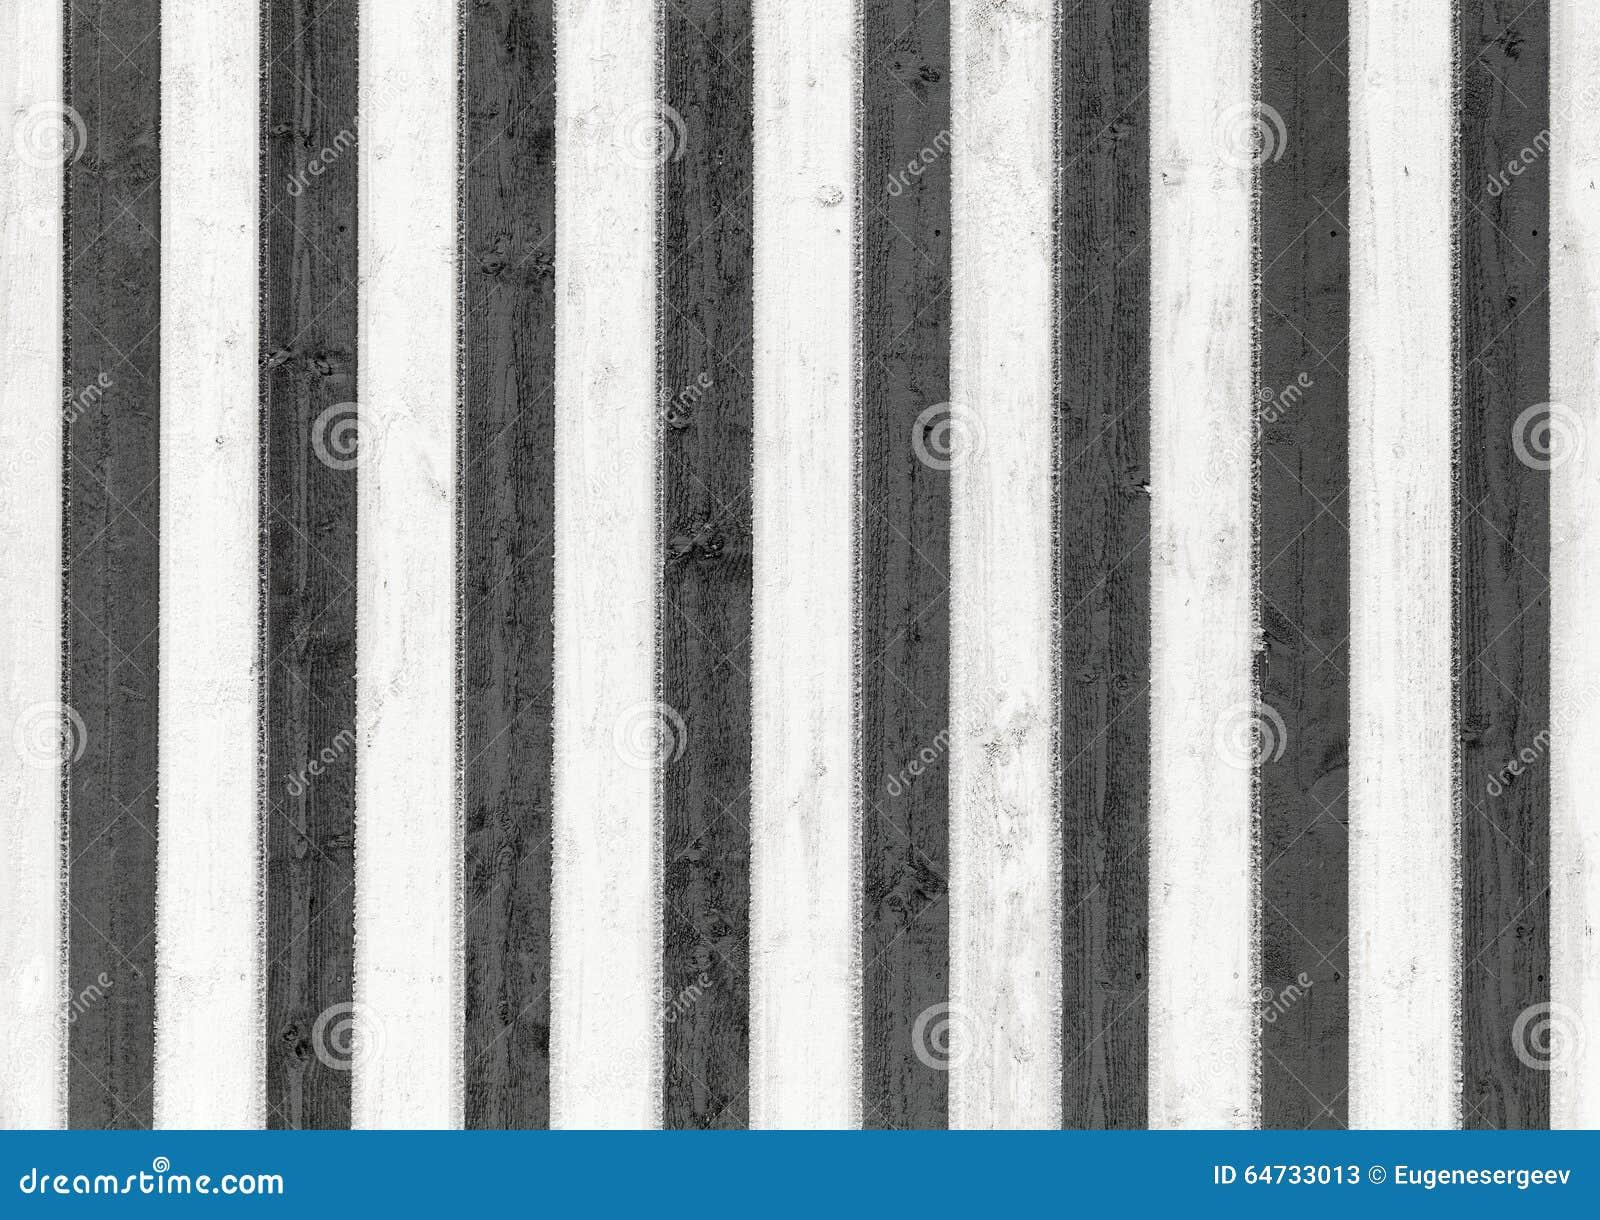 Frozen wooden wall. Background photo texture